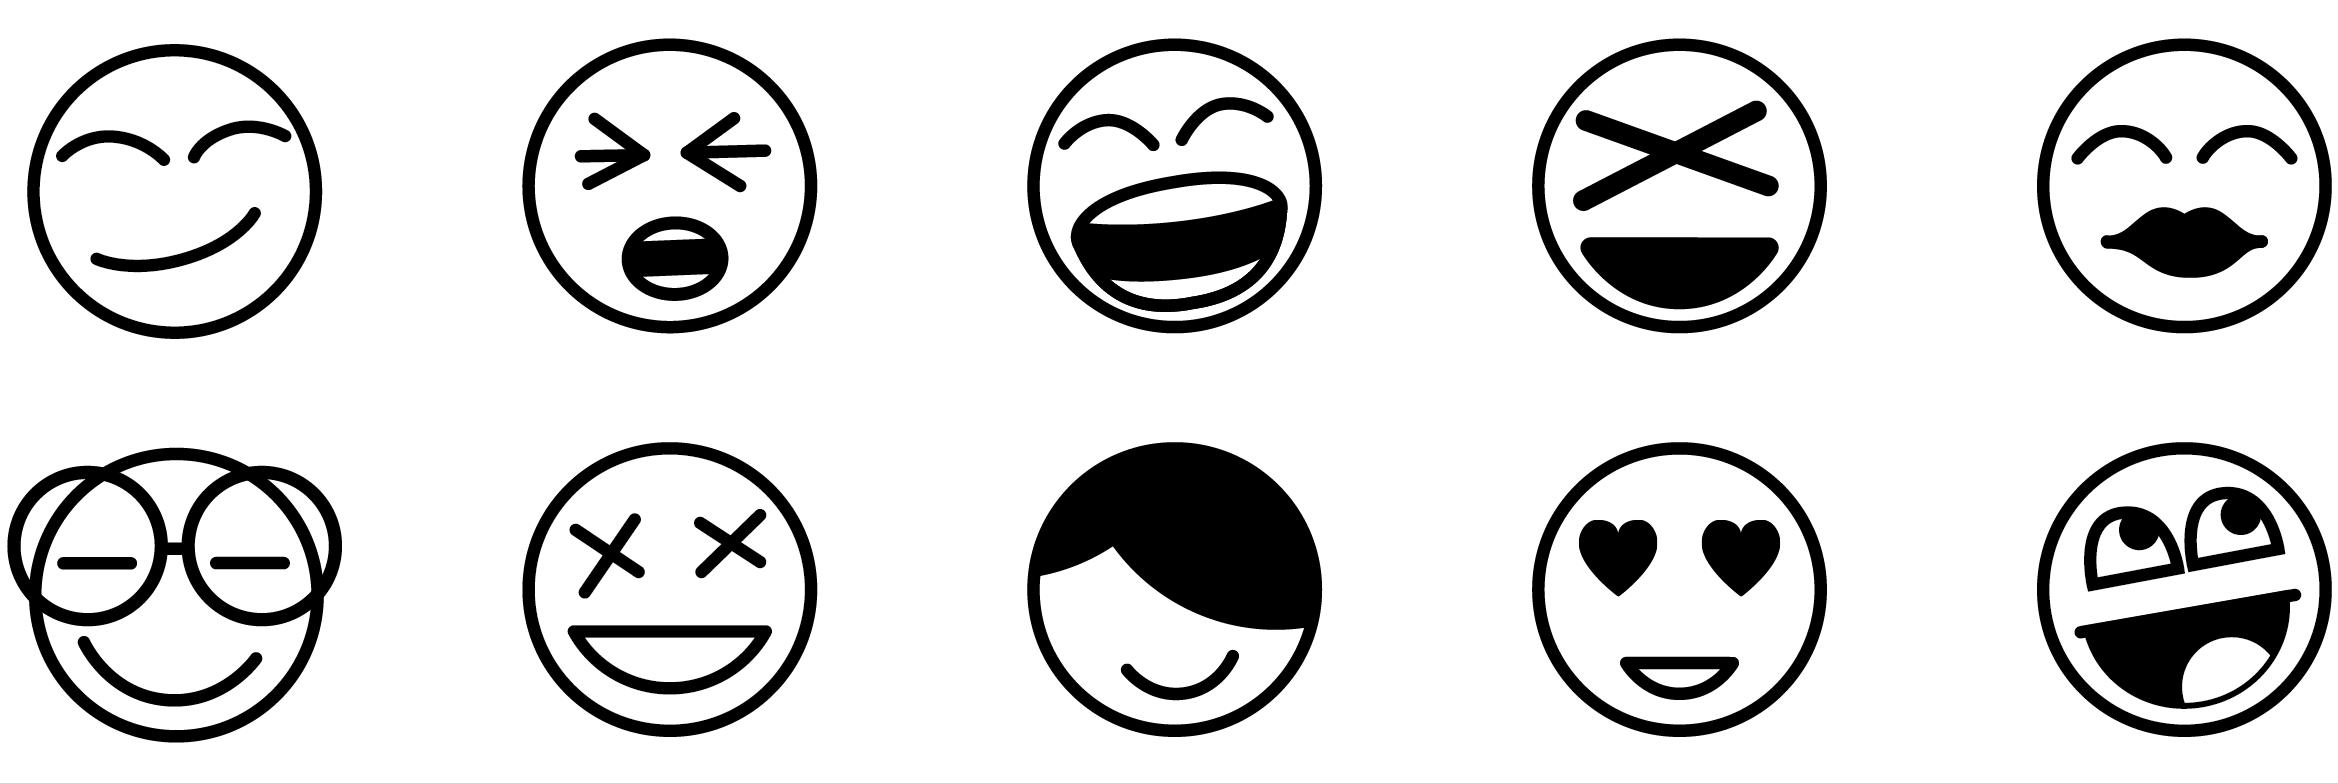 EURId emoticons-01